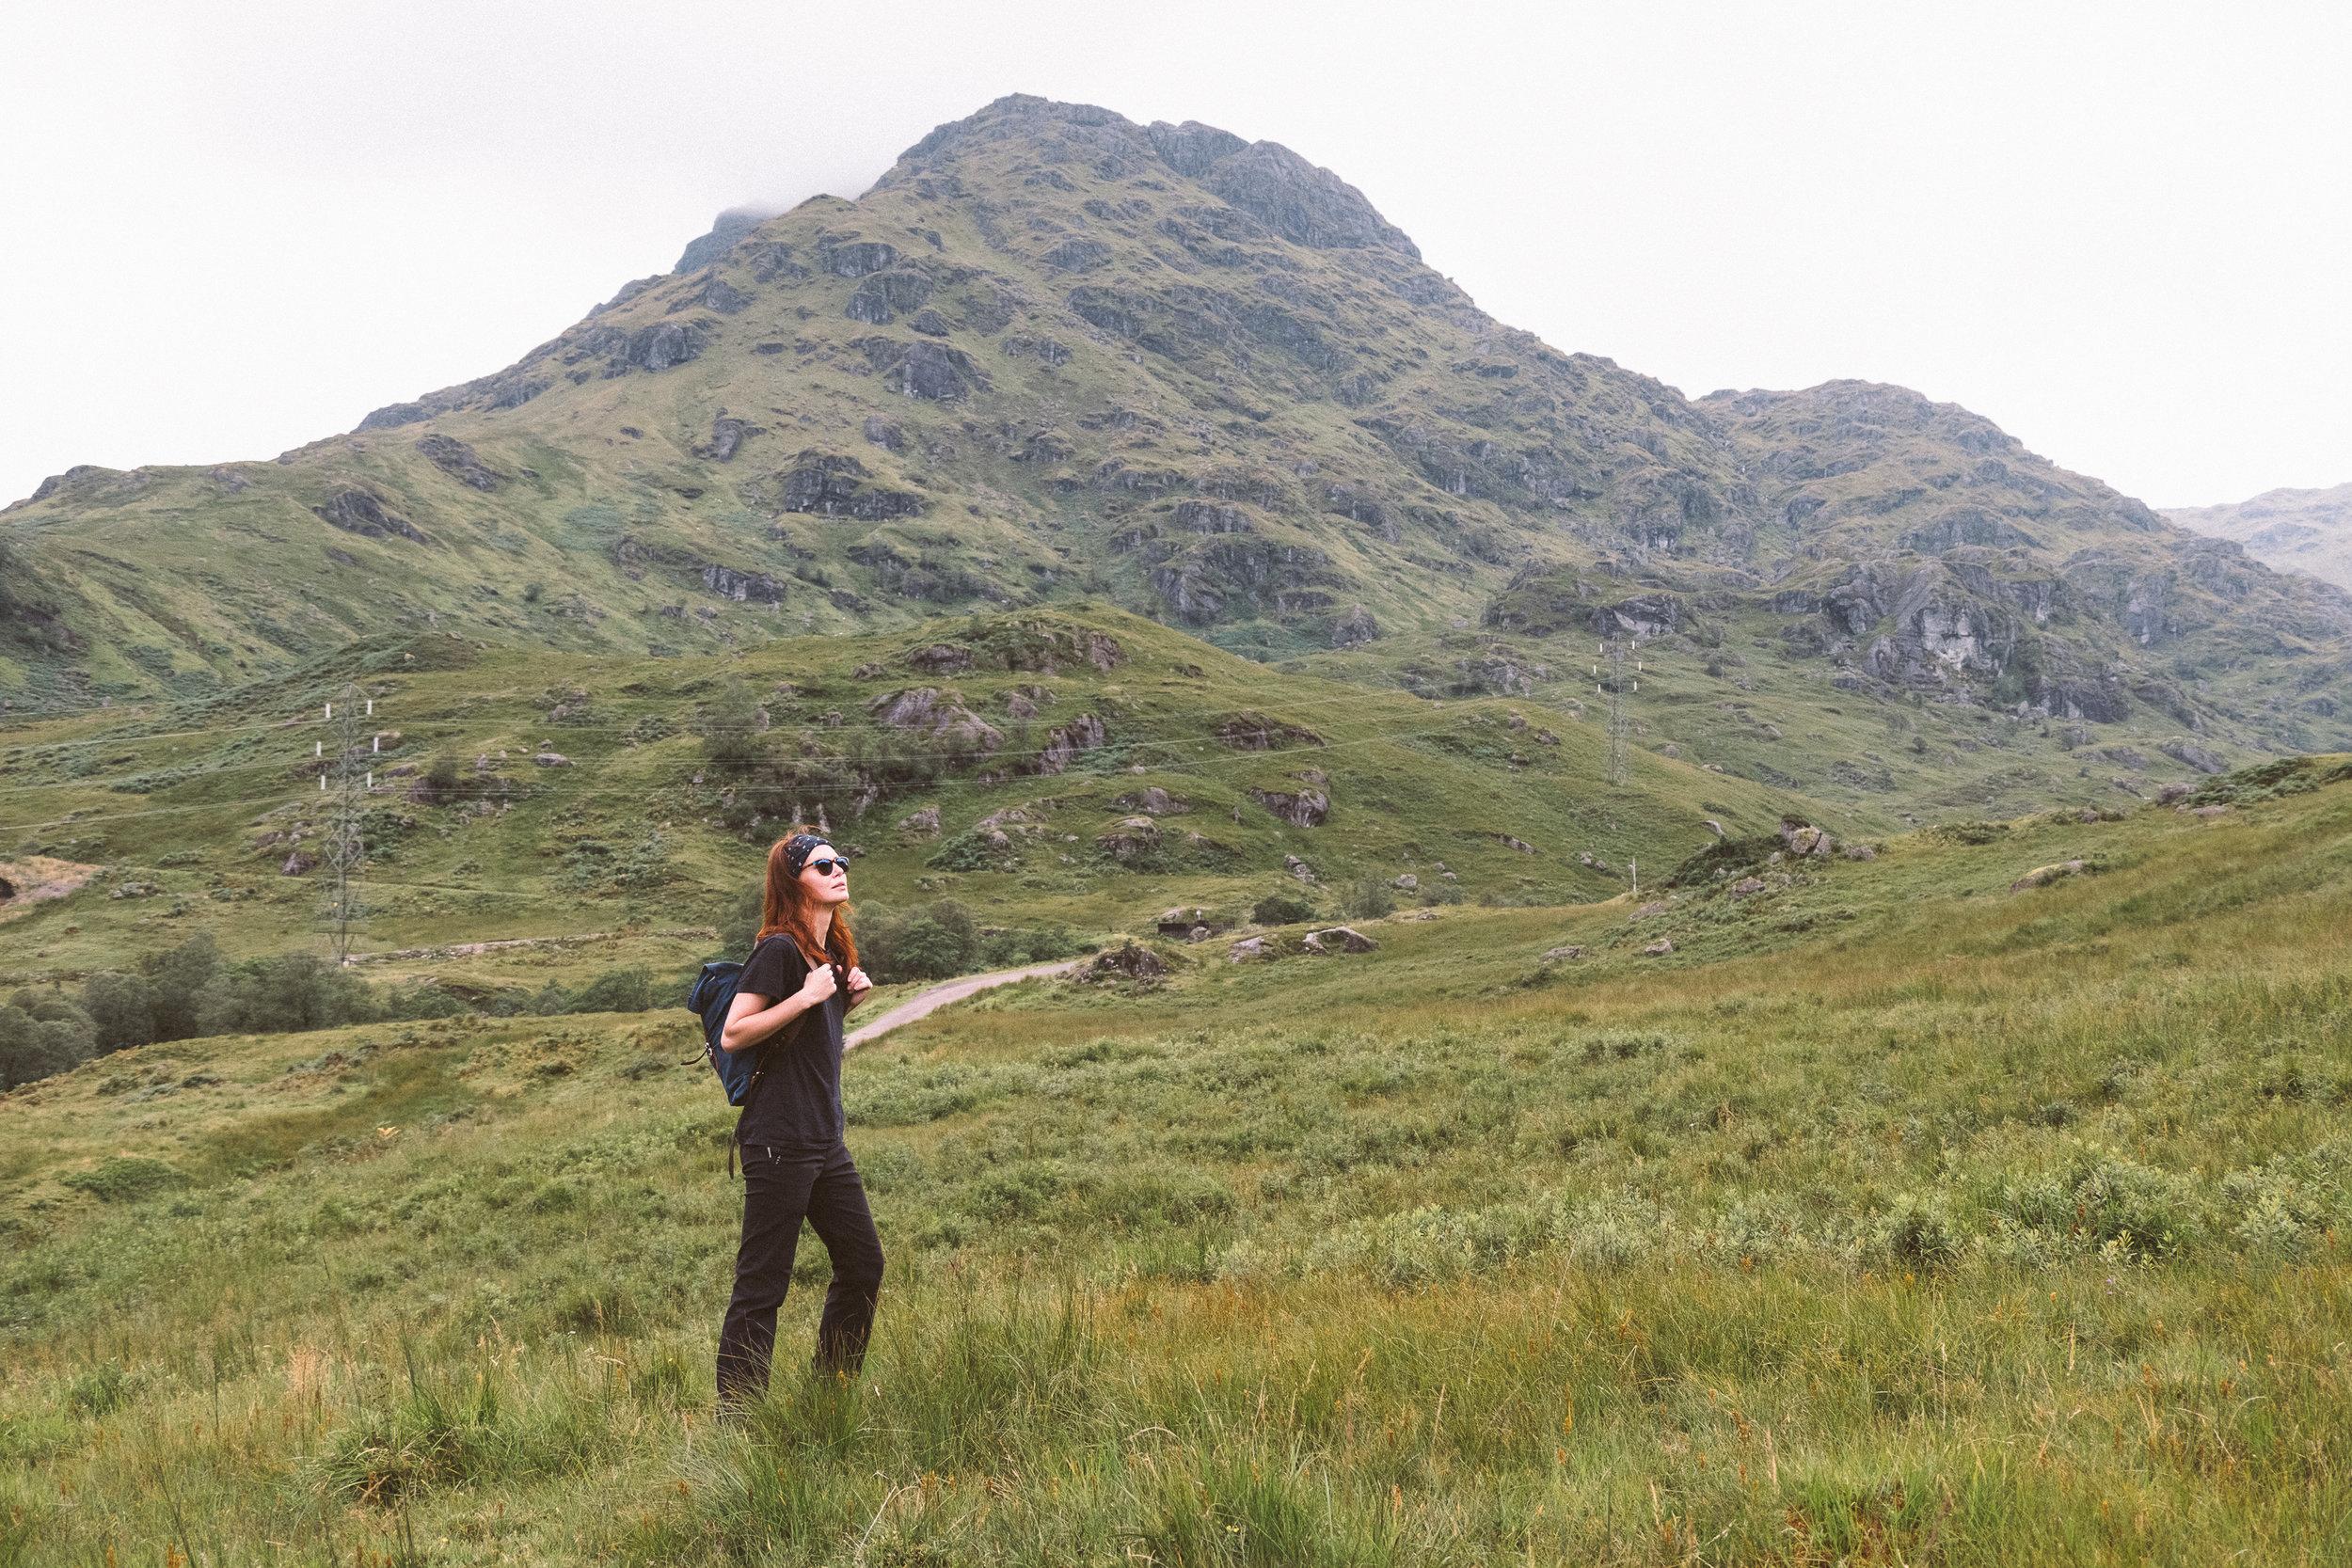 fat_creative_travel_blog_loch_sloy_easy_hike_scotland-12.jpg